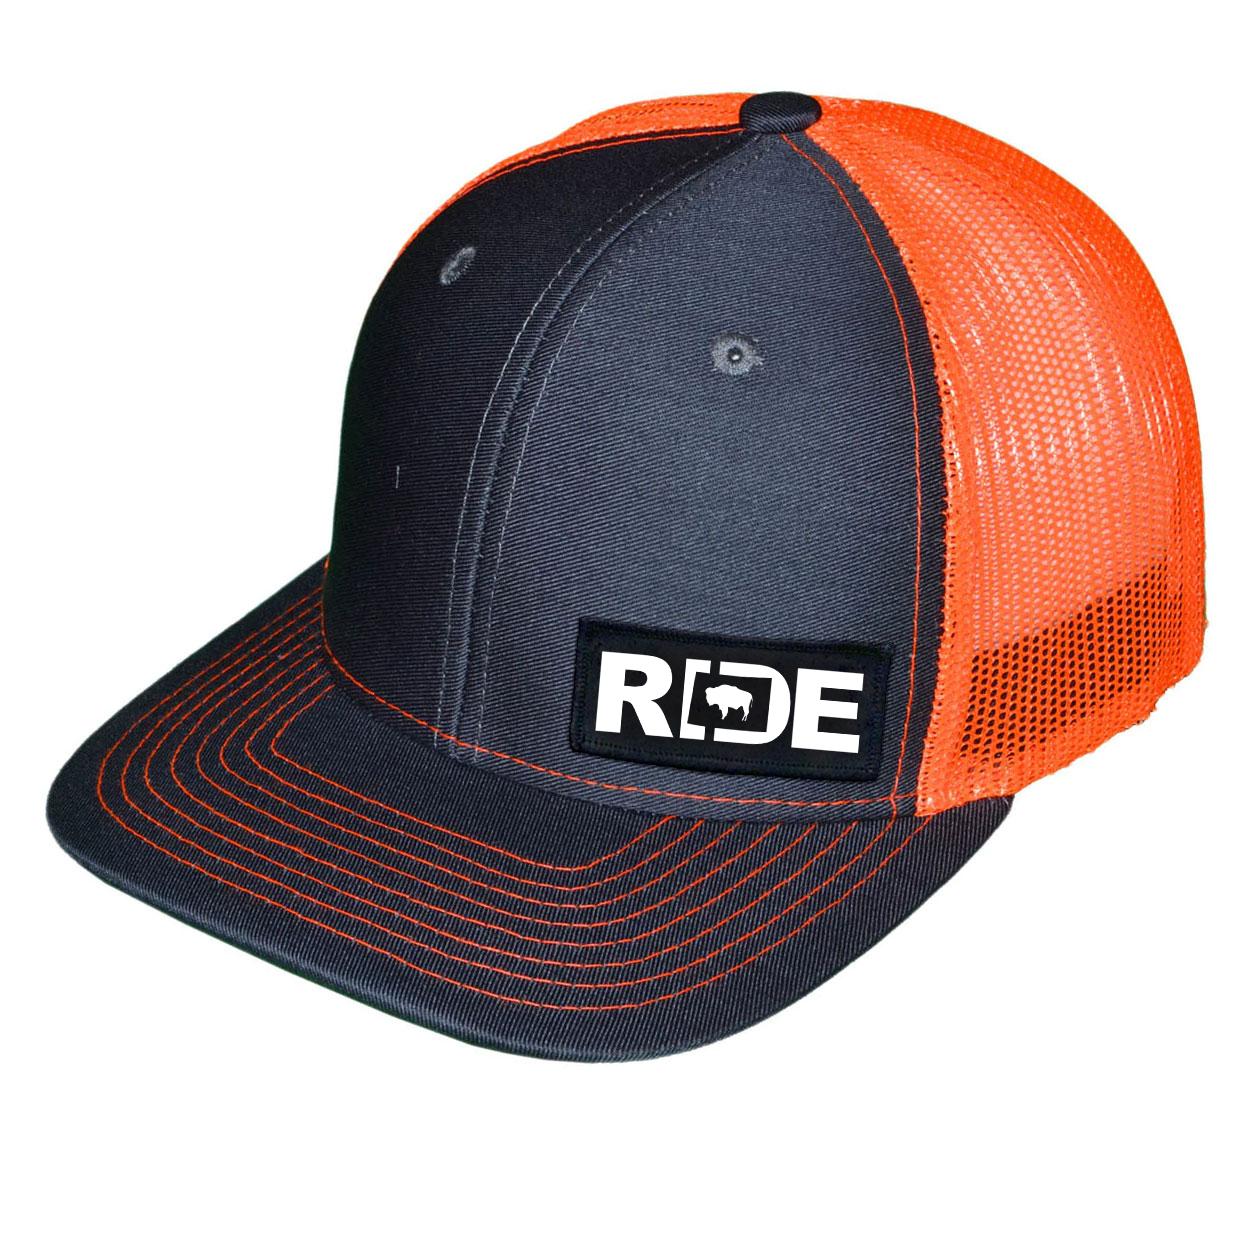 Ride Wyoming Night Out Woven Patch Snapback Trucker Hat Dark Gray/Orange (White Logo)